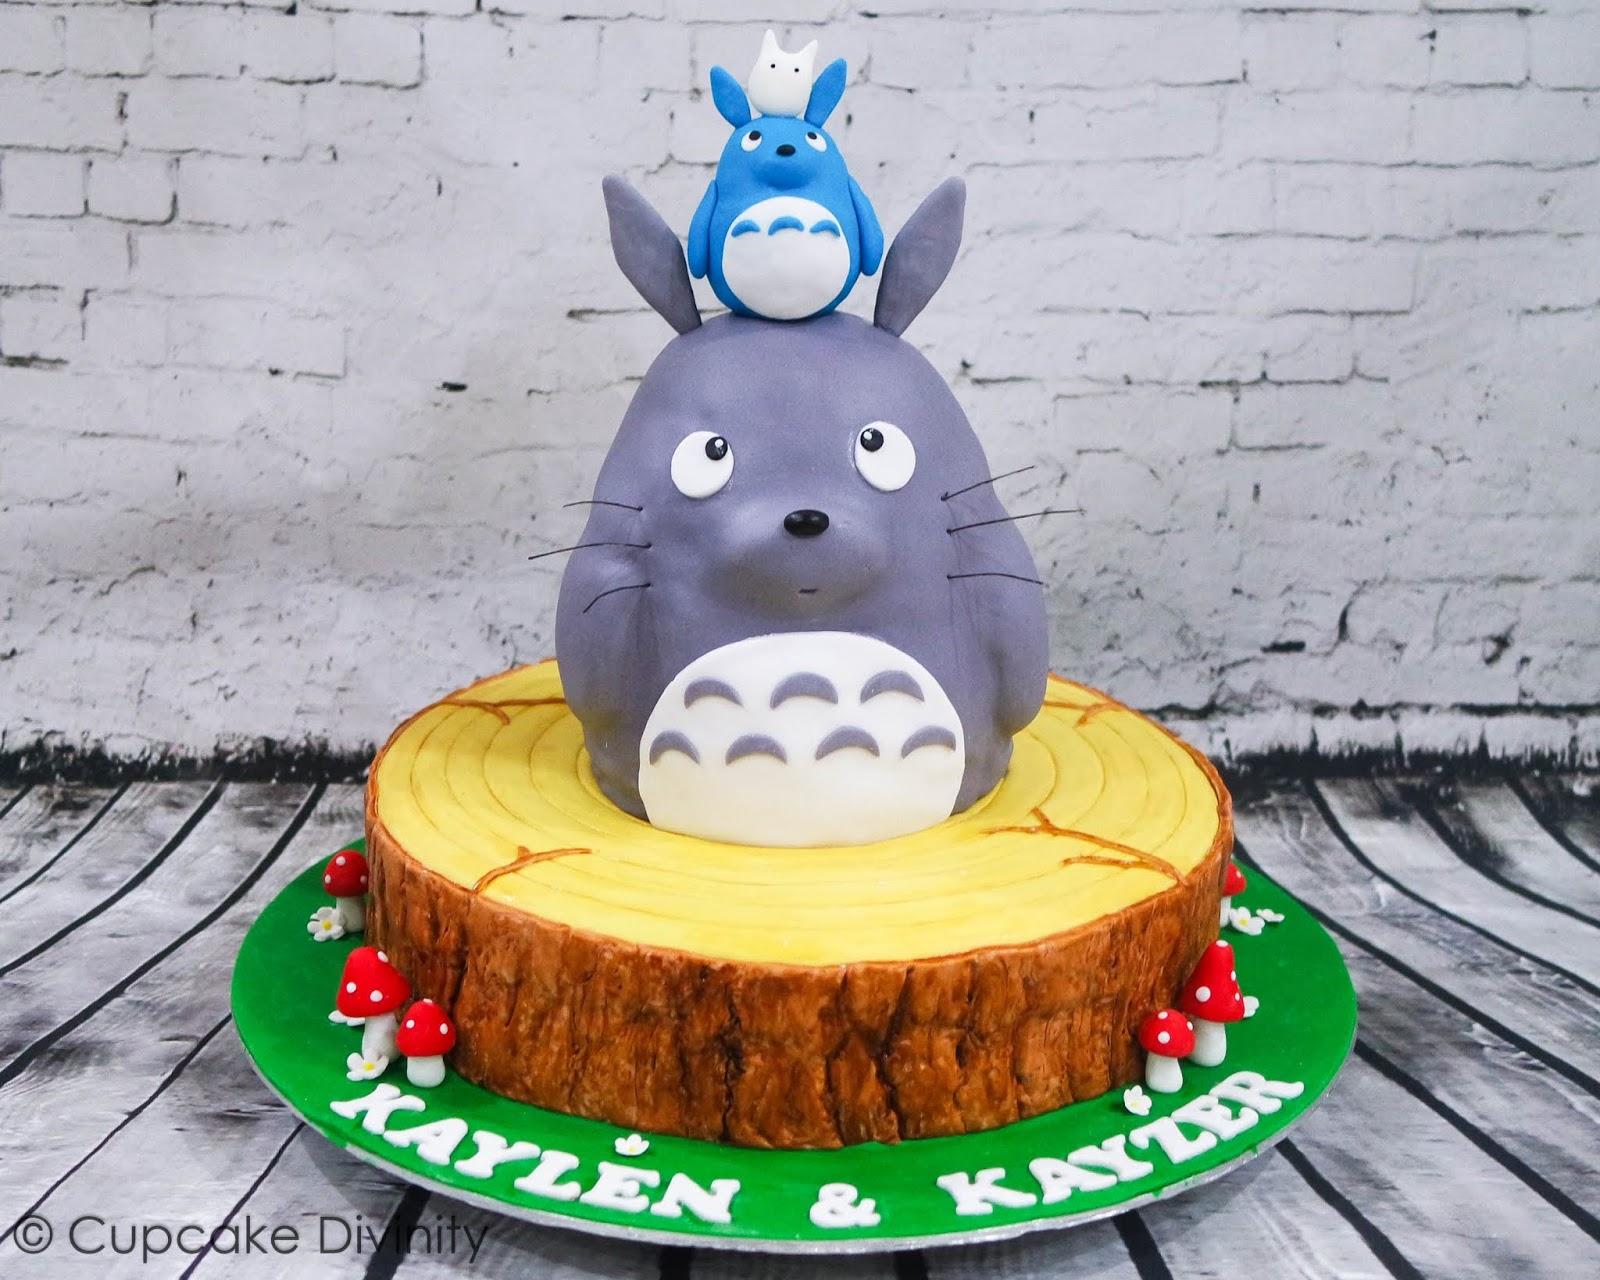 Astonishing Cupcake Divinity Totoro Cake Cupcakes Funny Birthday Cards Online Aeocydamsfinfo